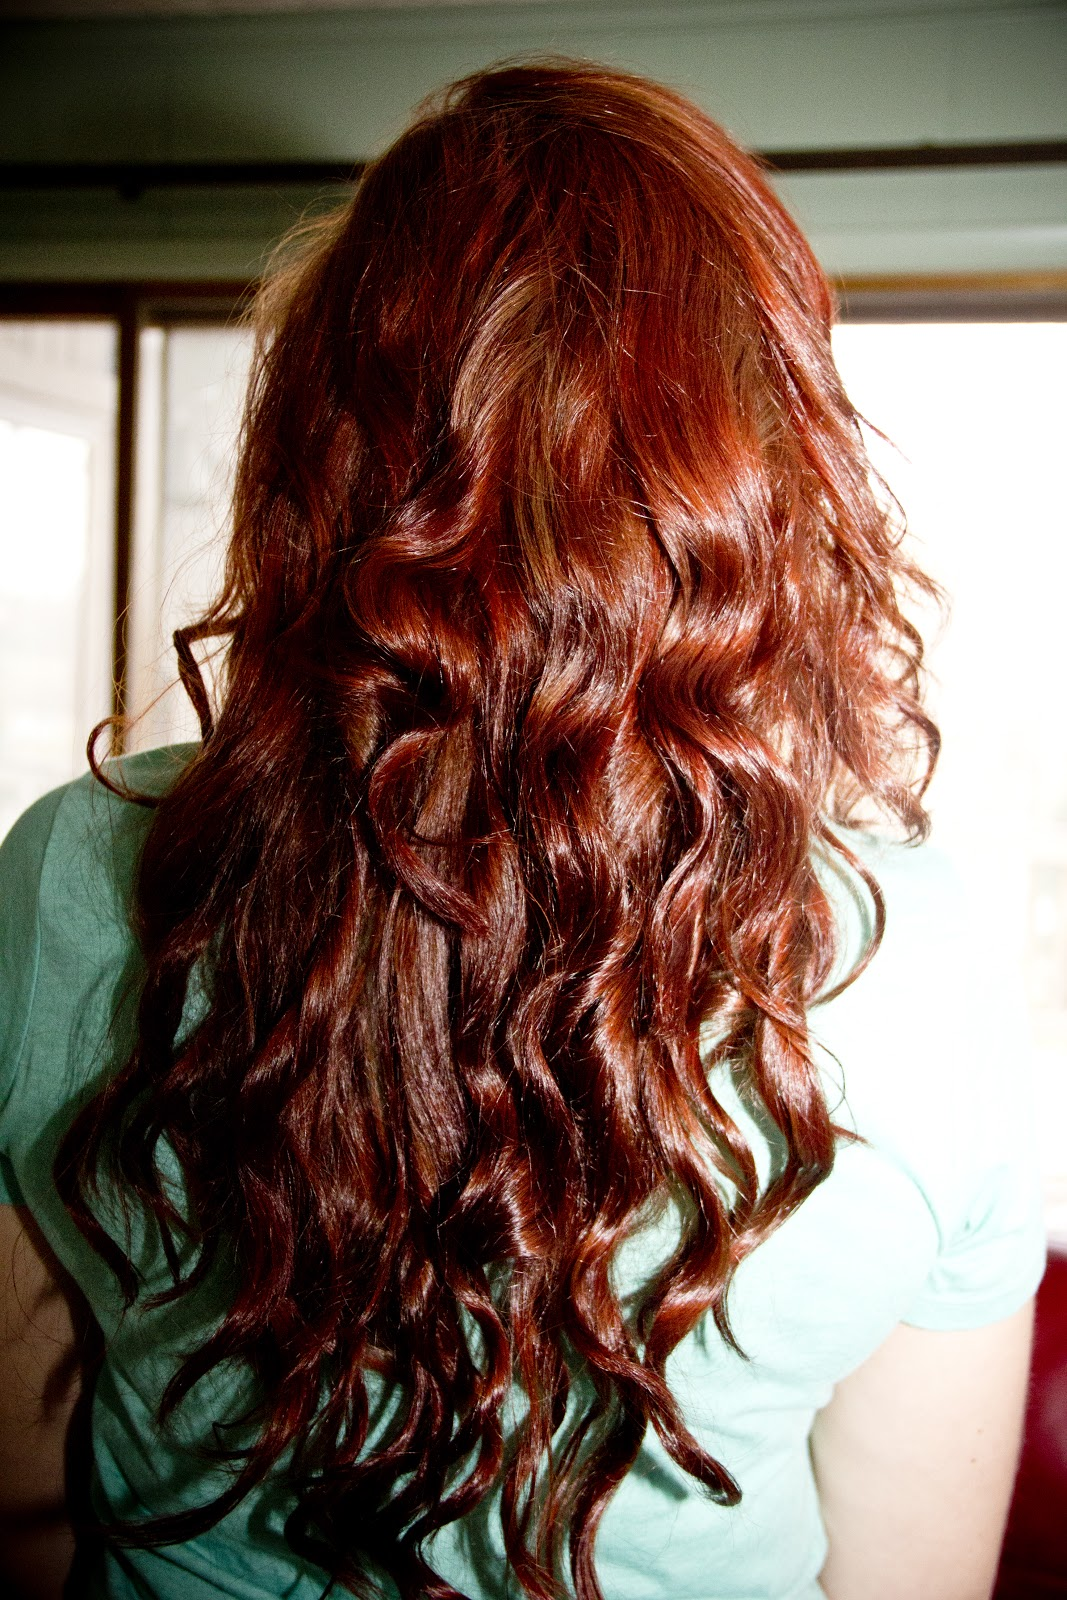 Lipstick & Chiffon : Cinnaberry Tresses